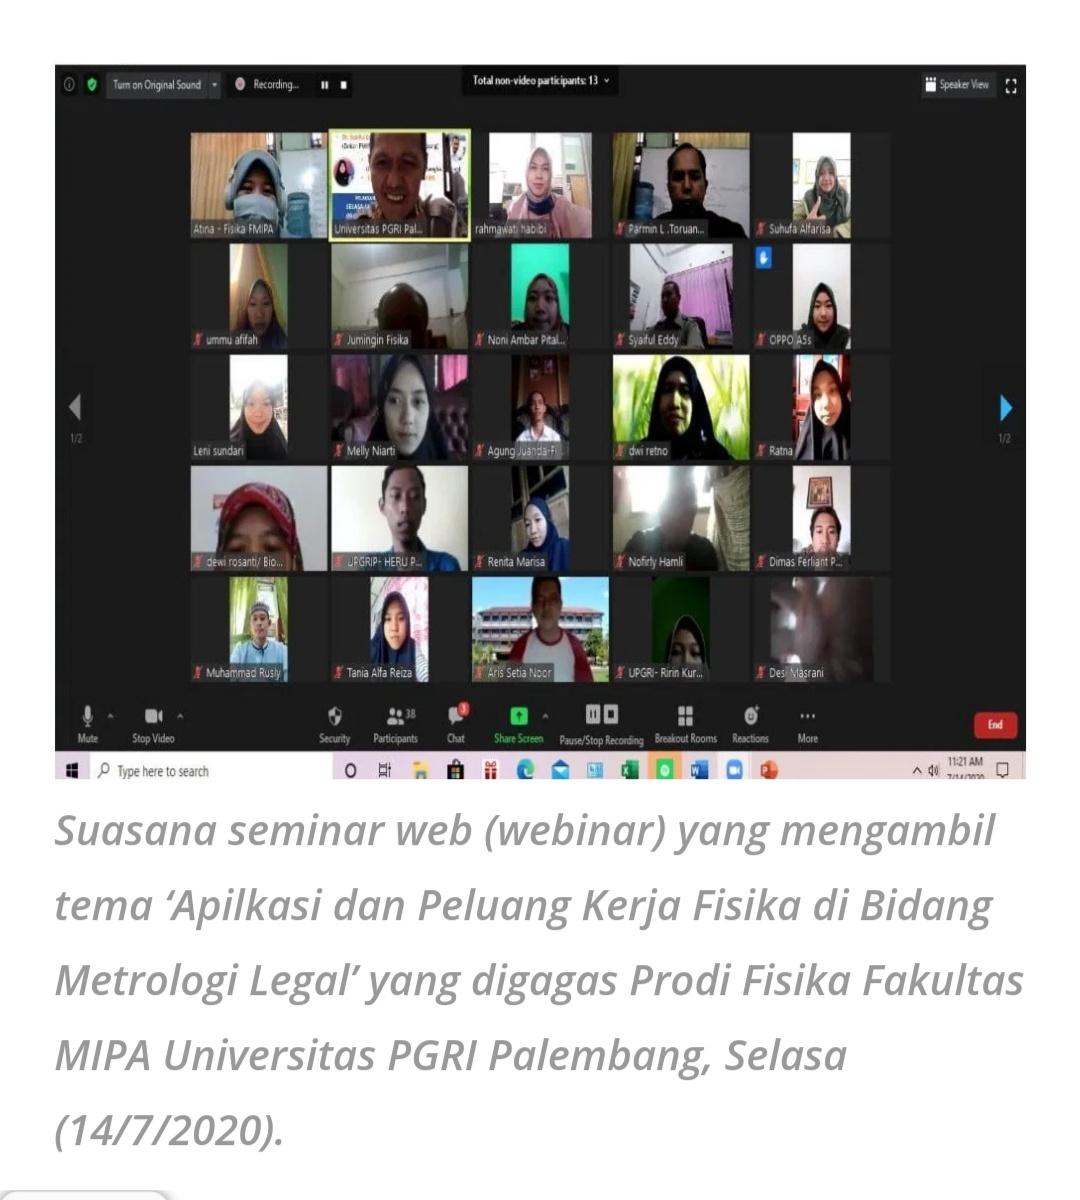 Peserta Antusias Ikuti Webinar yang Digagas Prodi Fisika Fakultas MIPA Universitas PGRI Palembang